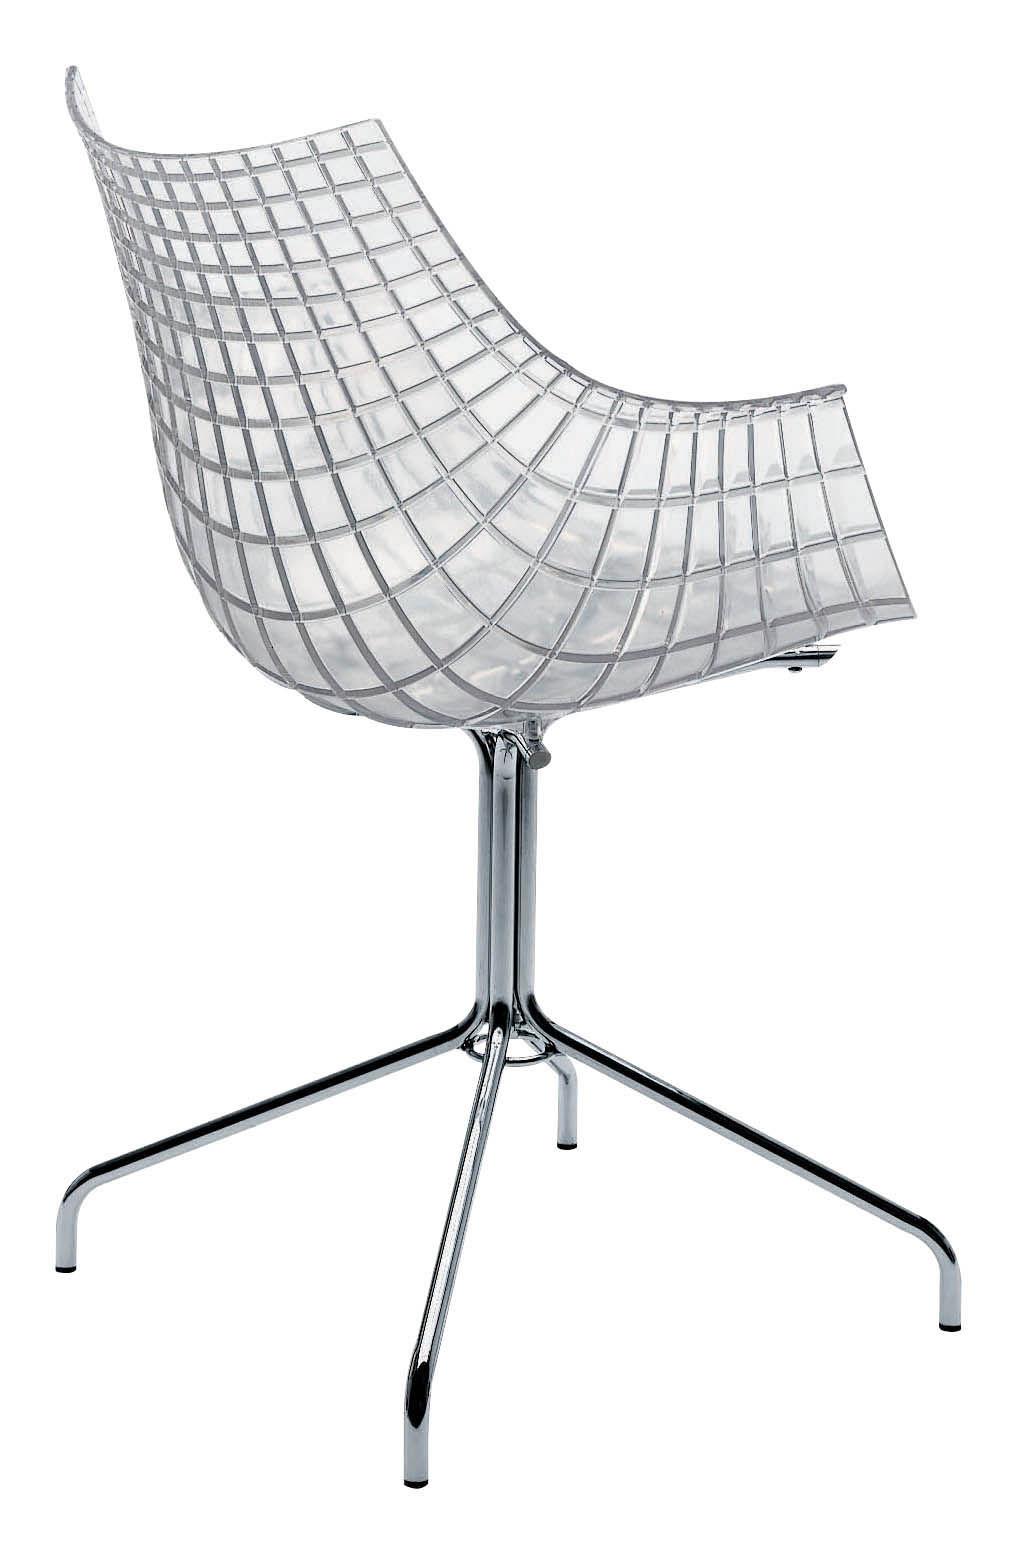 fauteuil meridiana polycarbonate transparent transparent driade made in design. Black Bedroom Furniture Sets. Home Design Ideas